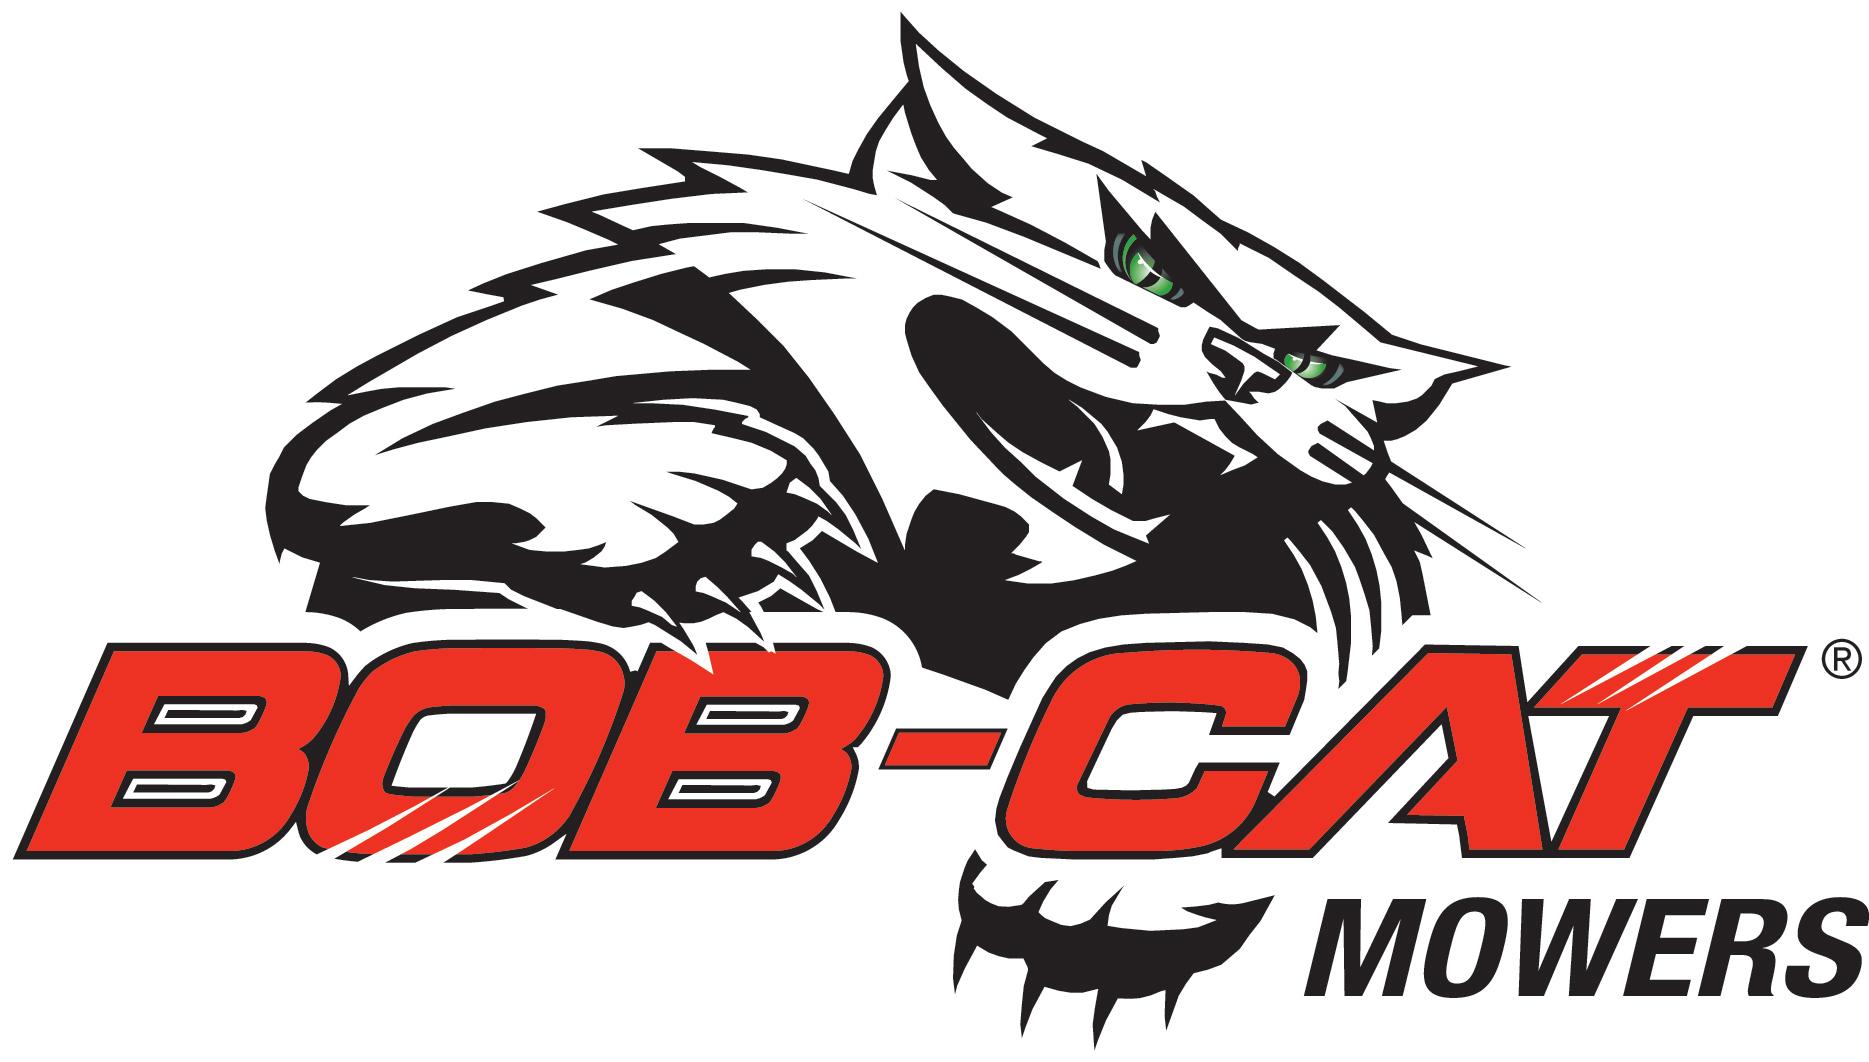 Bobcat mower Logos